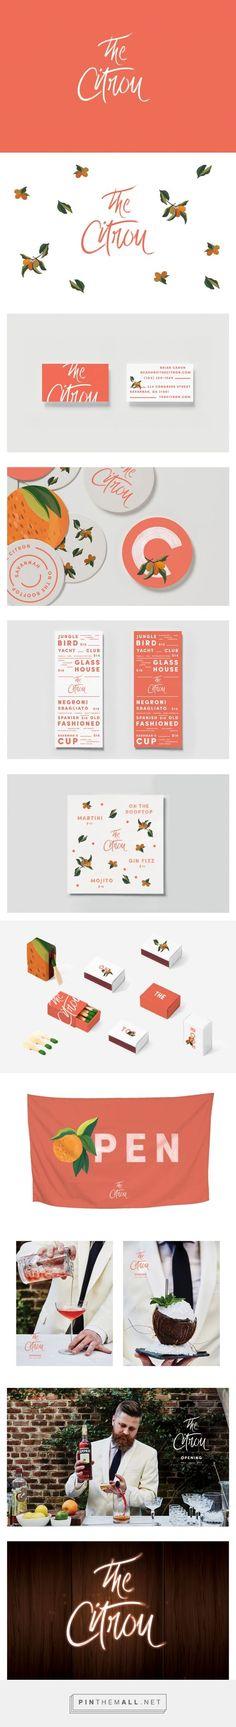 The Citron Branding by Maud Passini | Fivestar Branding – Design and Branding Agency & Inspiration Gallery